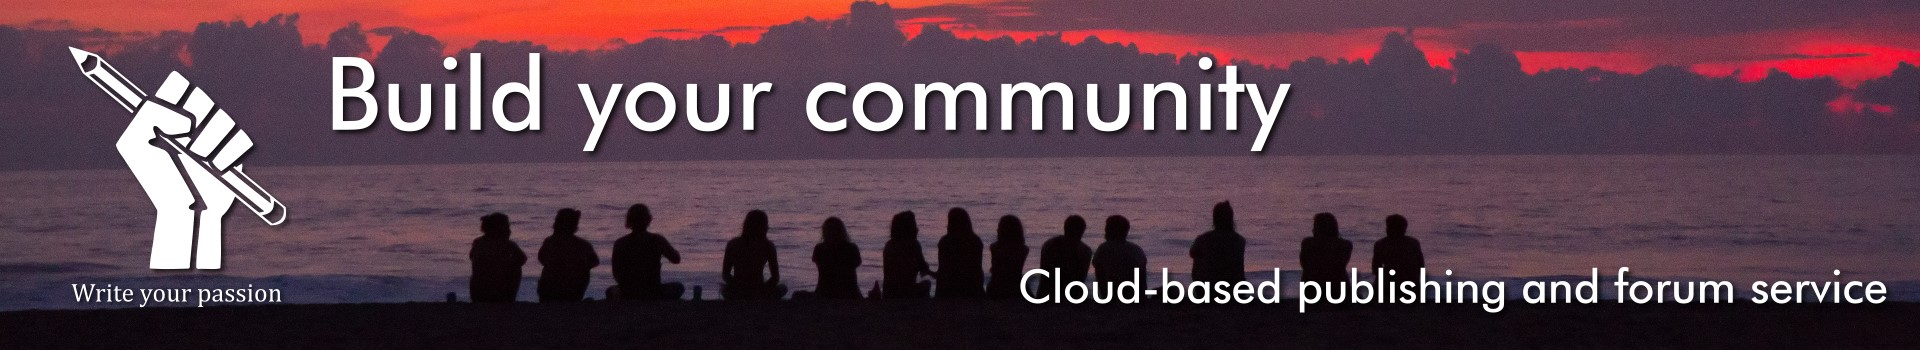 Community 1920 x 350 01